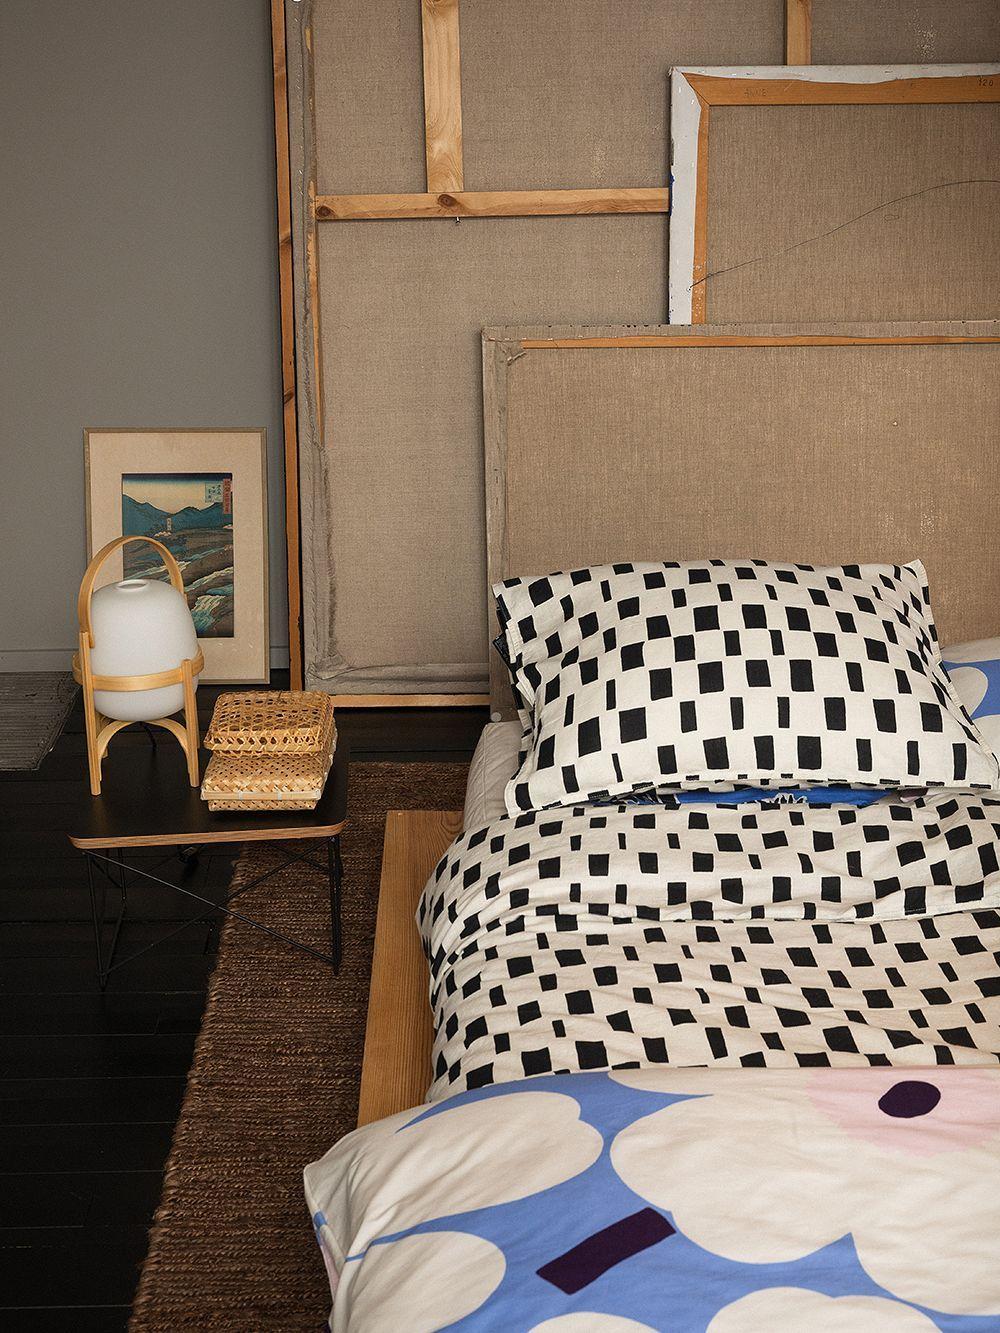 Marimekko S Fall Winter Home Collection 2019 Design Stories Kids Furniture Stores Marimekko Bedding Marimekko